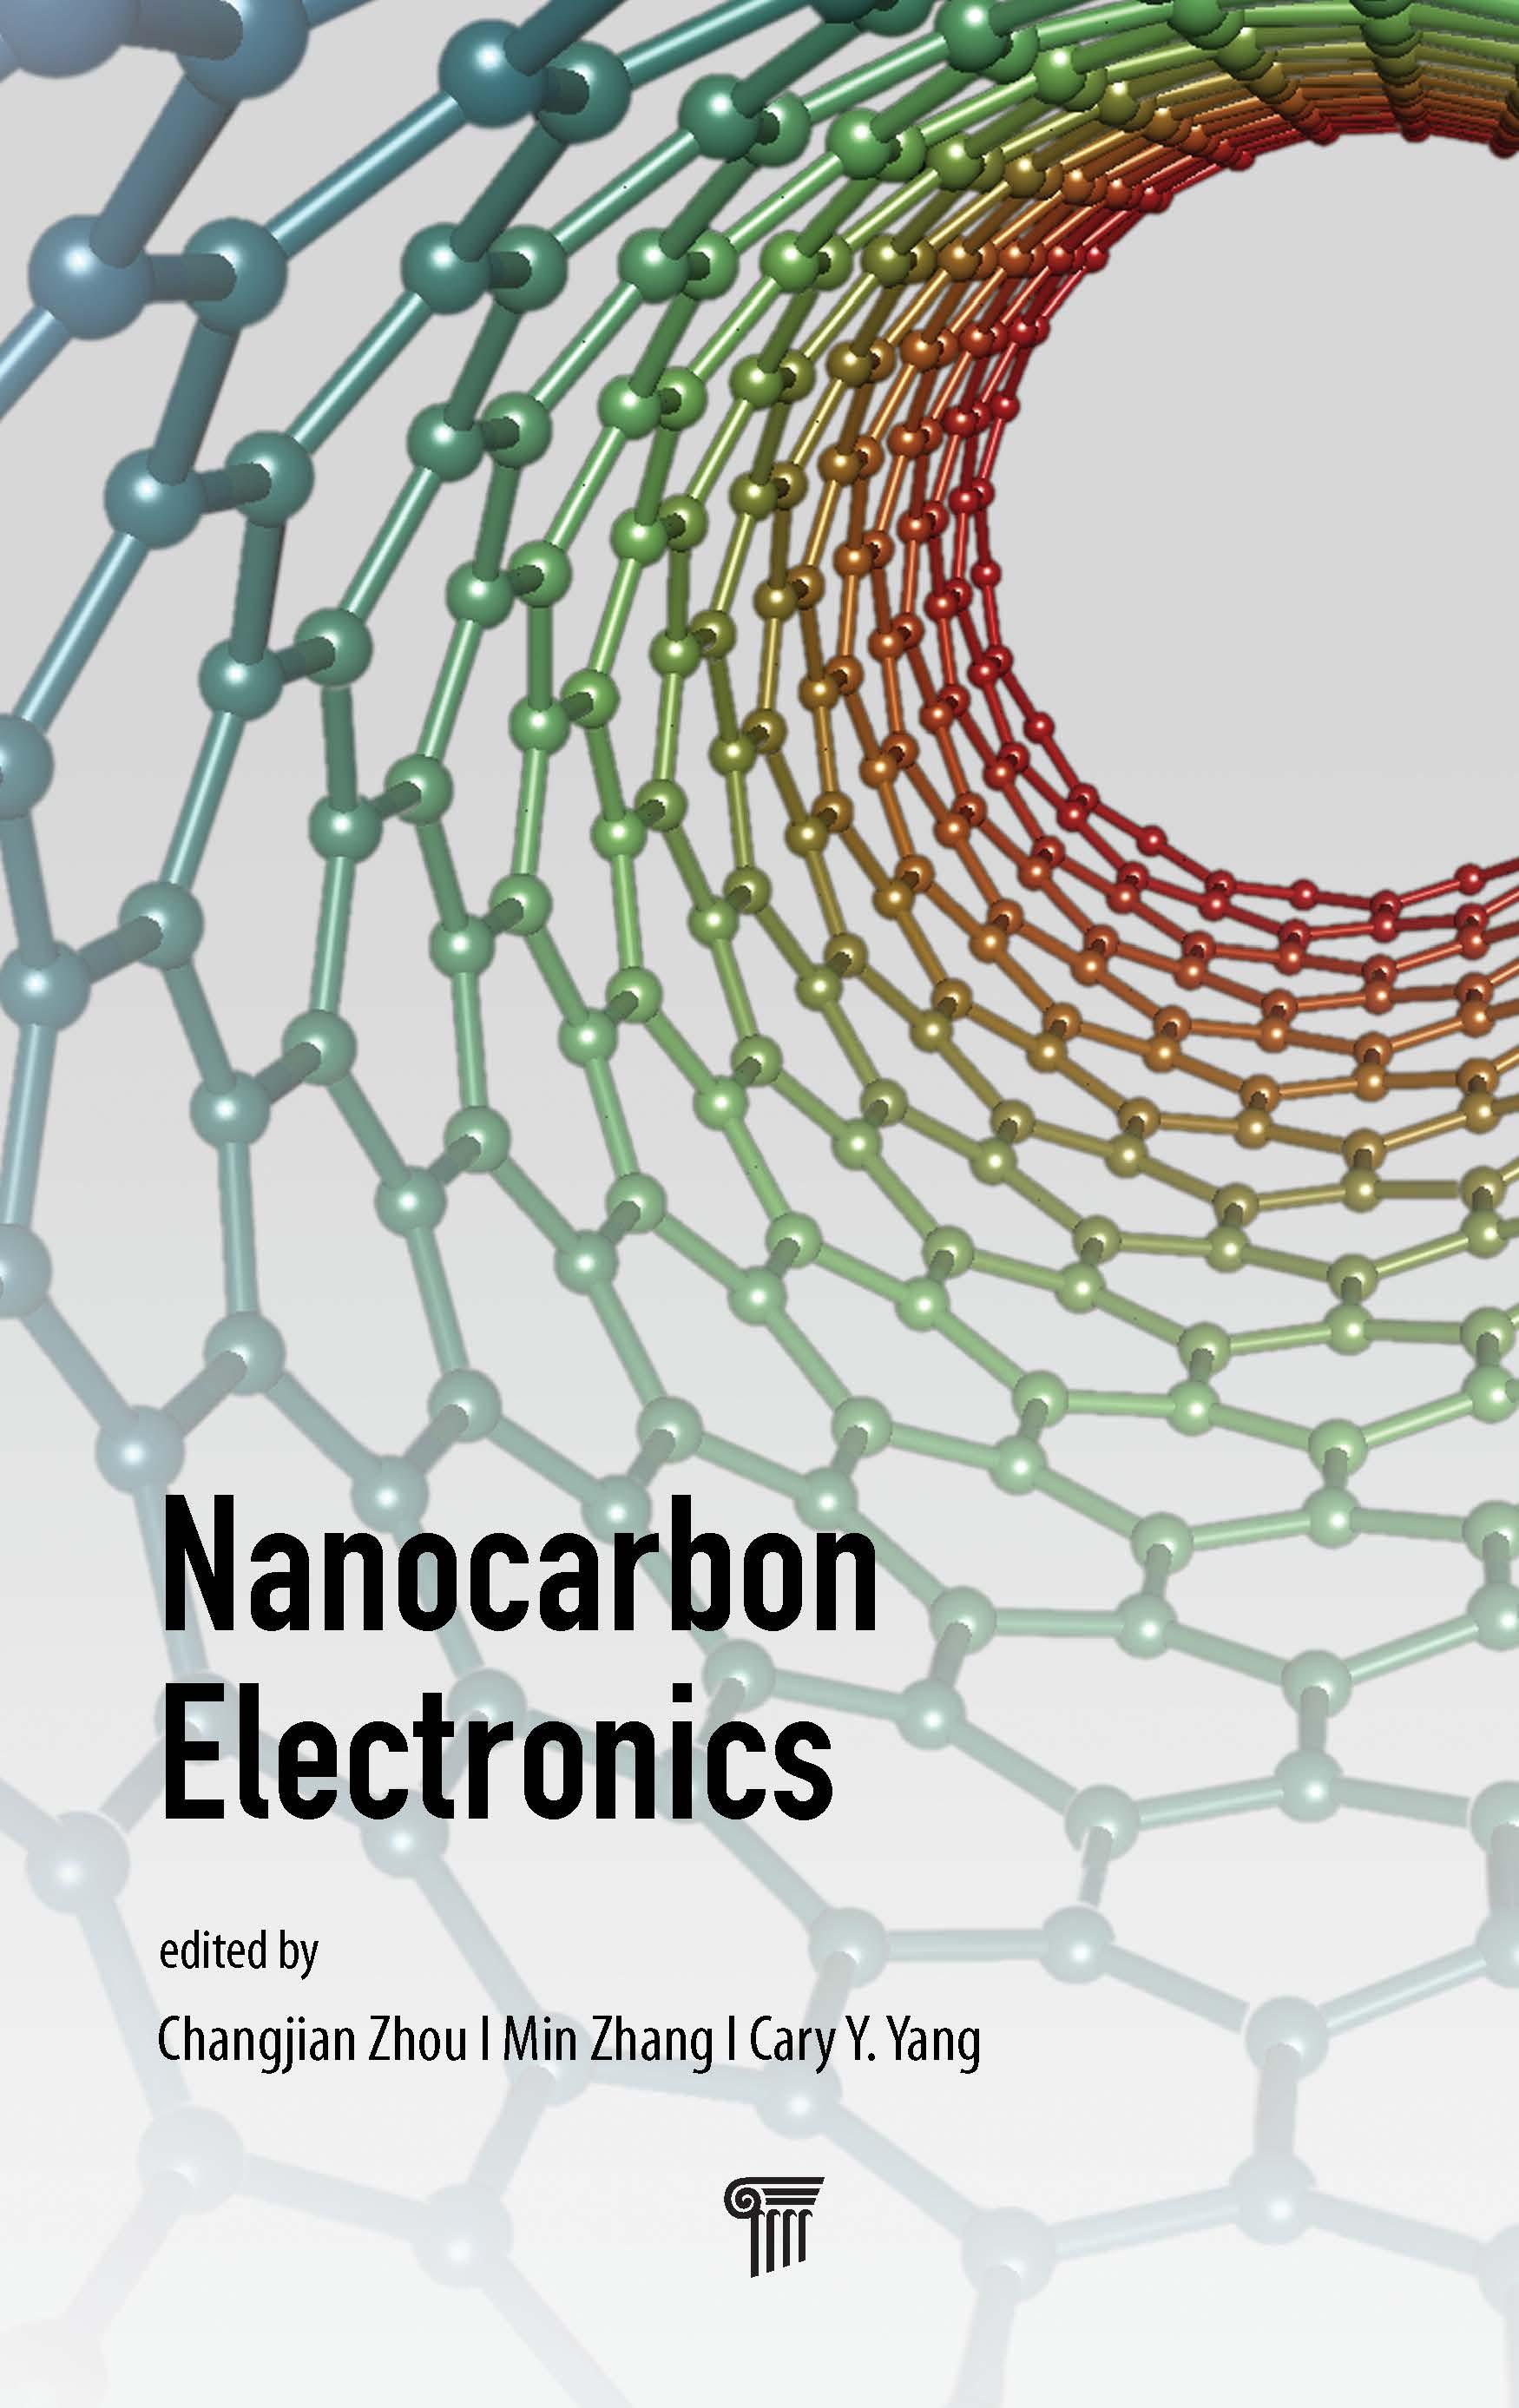 Nanocarbon Electronics book cover